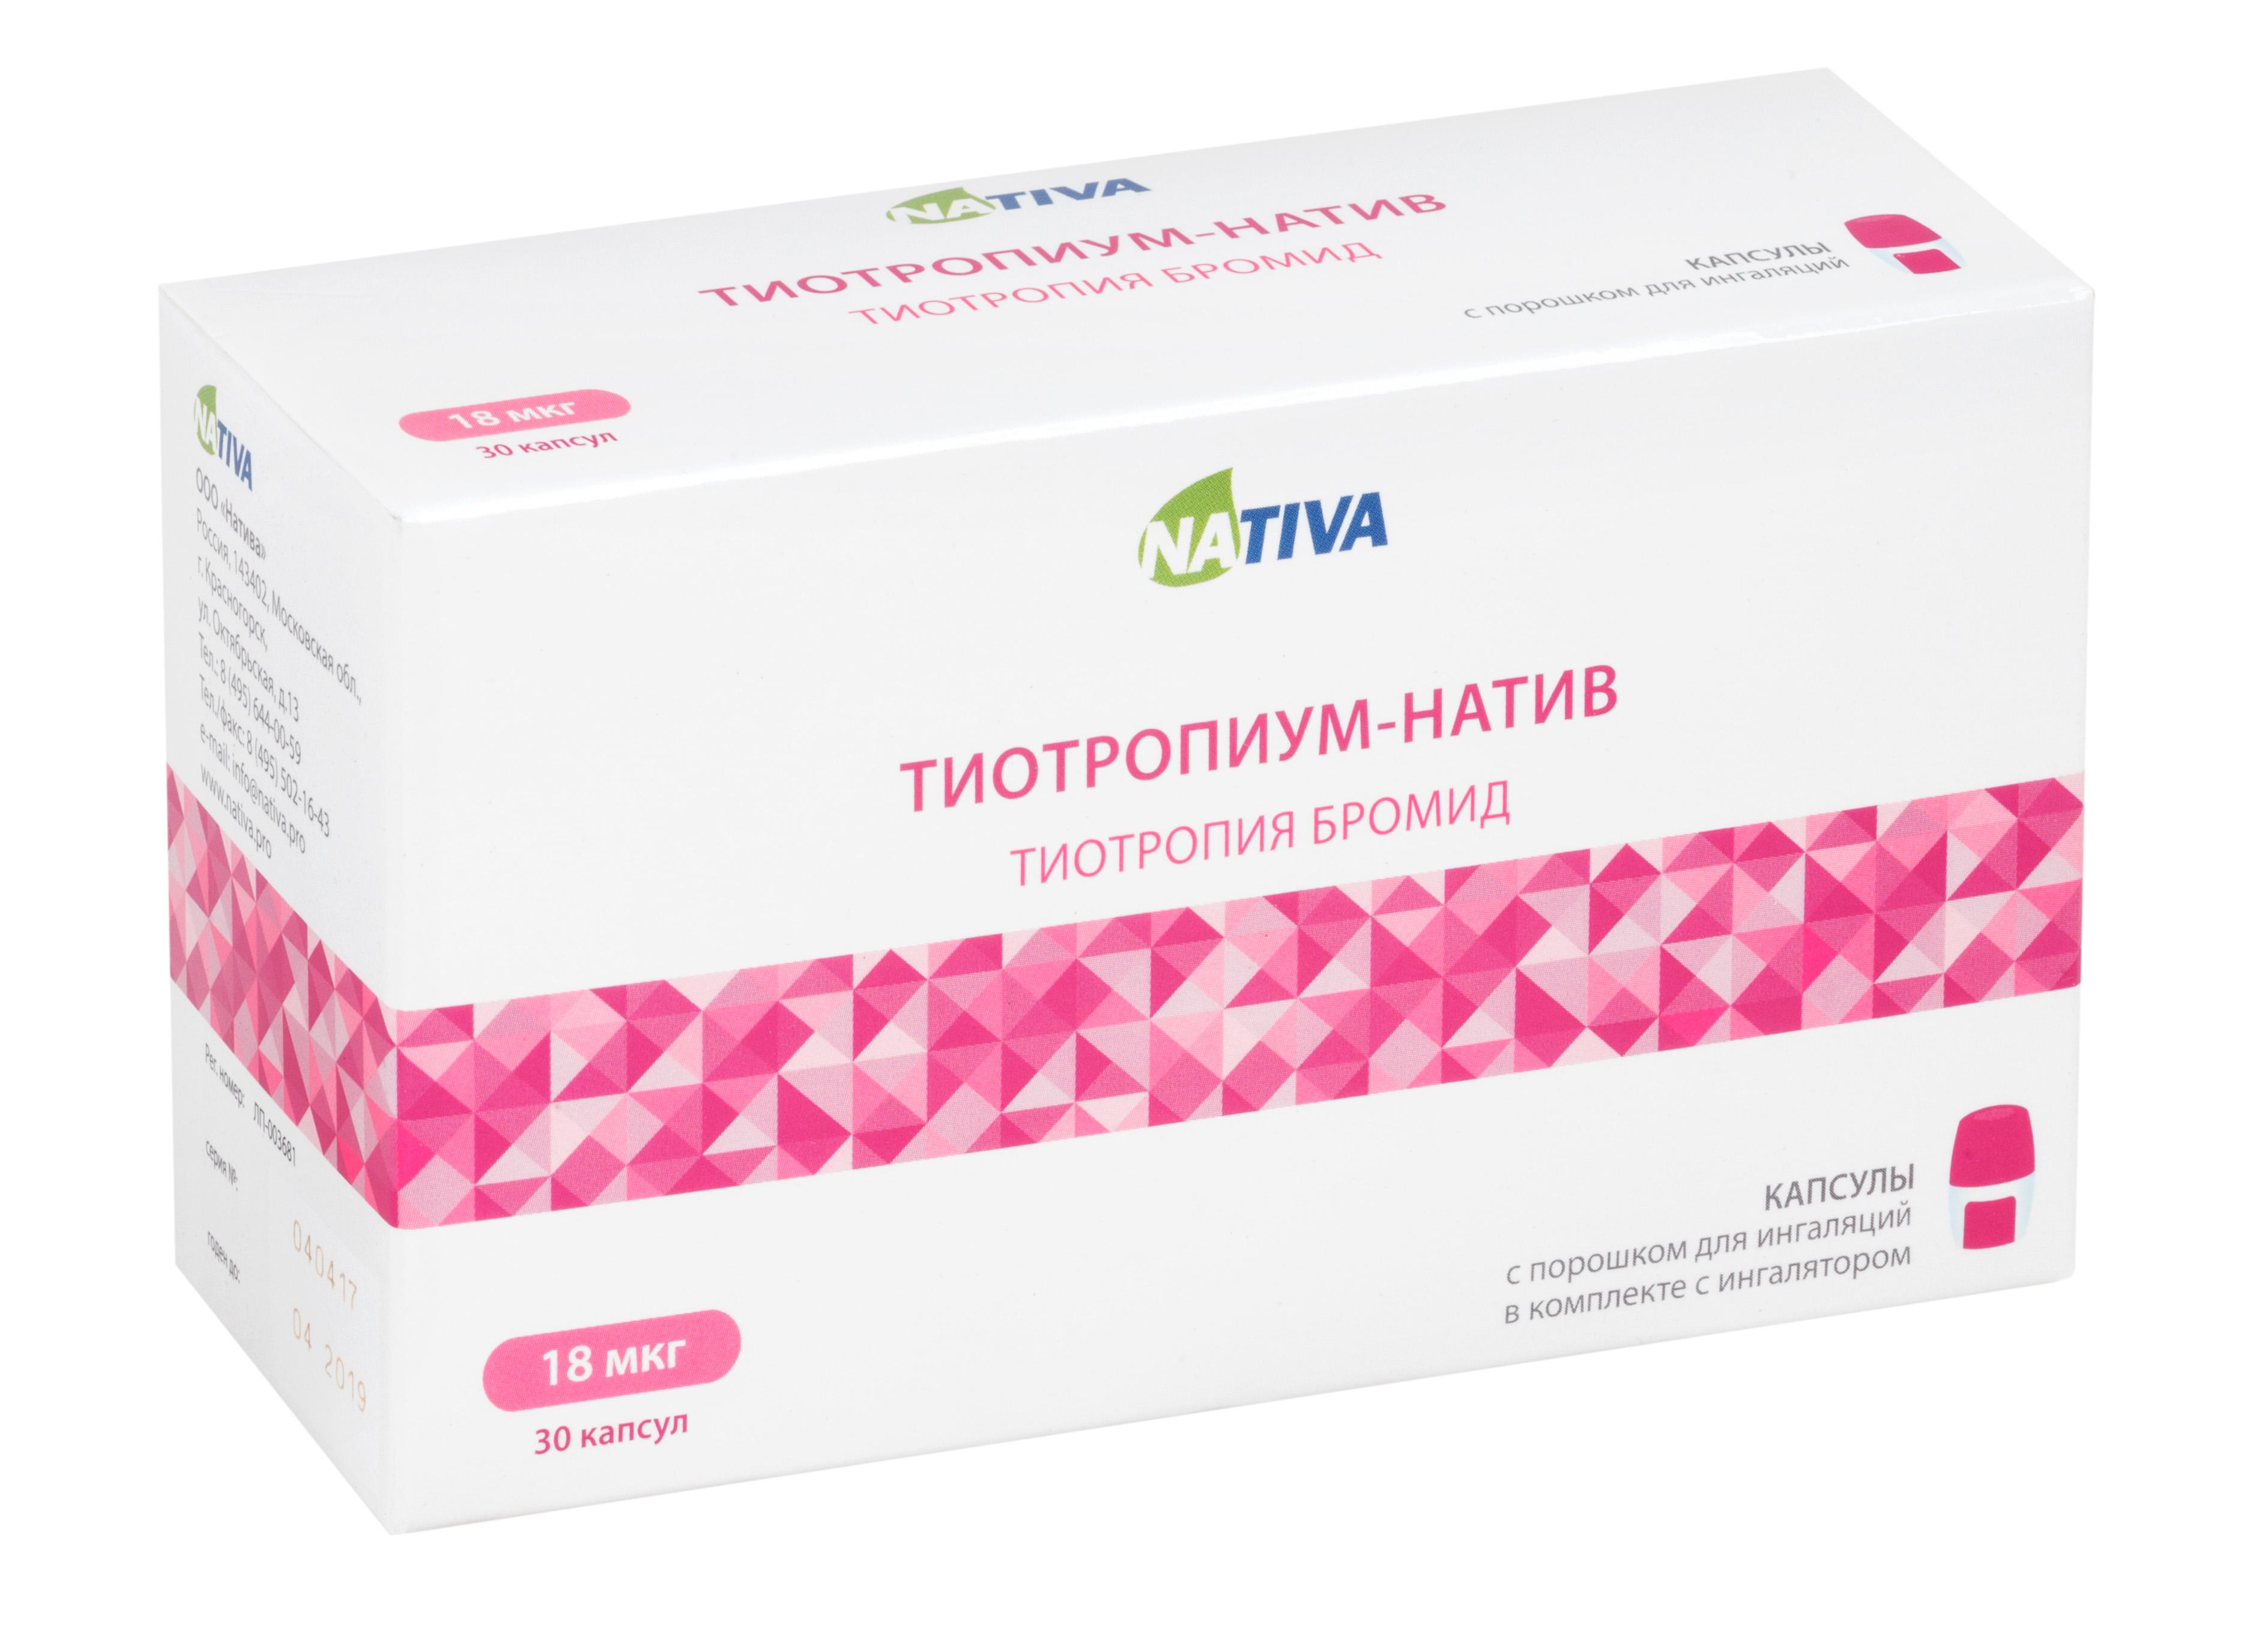 Тиотропиум-натив капс. с пор.д/инг. 18 мкг №30 ( в компл. с устр. д/инг.)